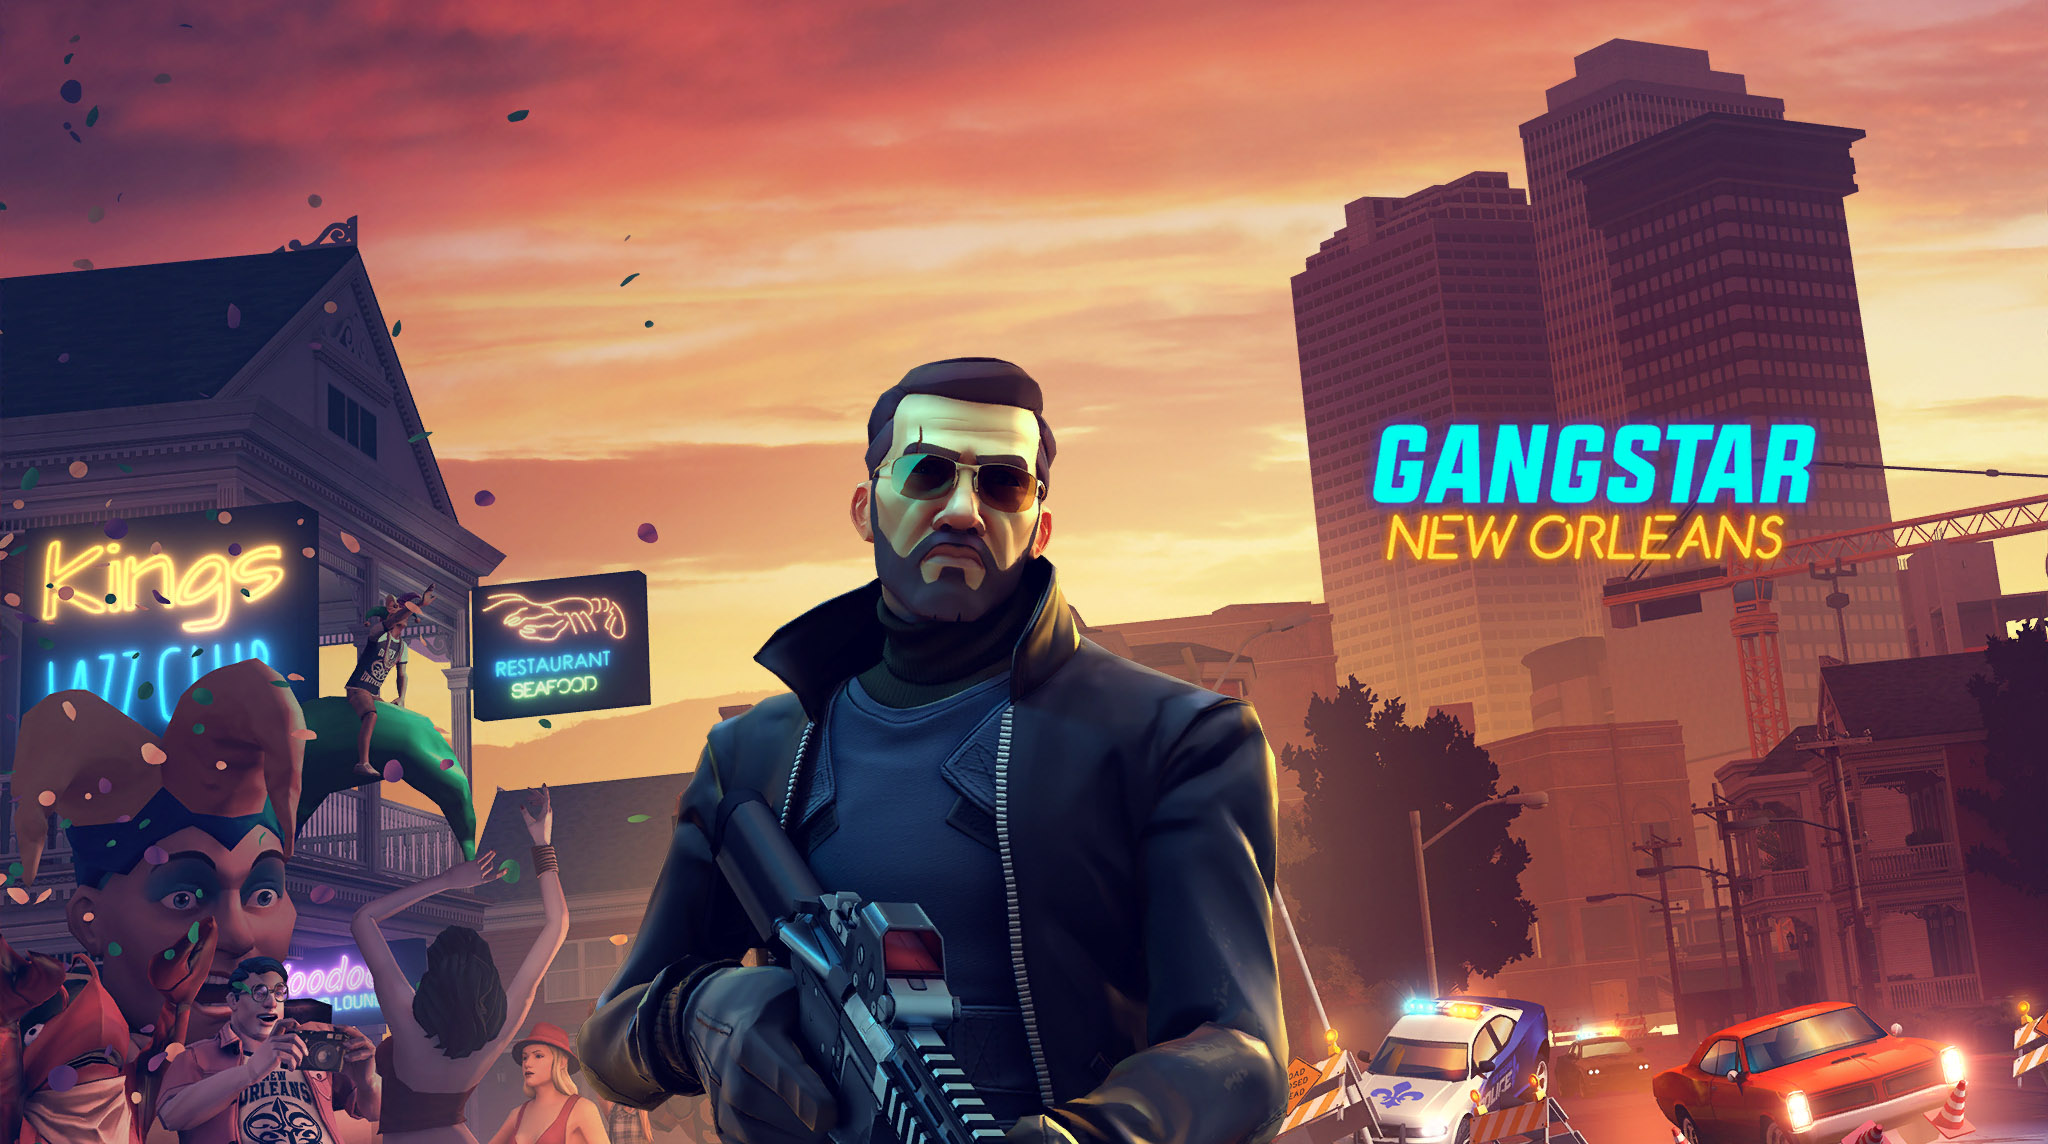 Gangstar New Orleans 1